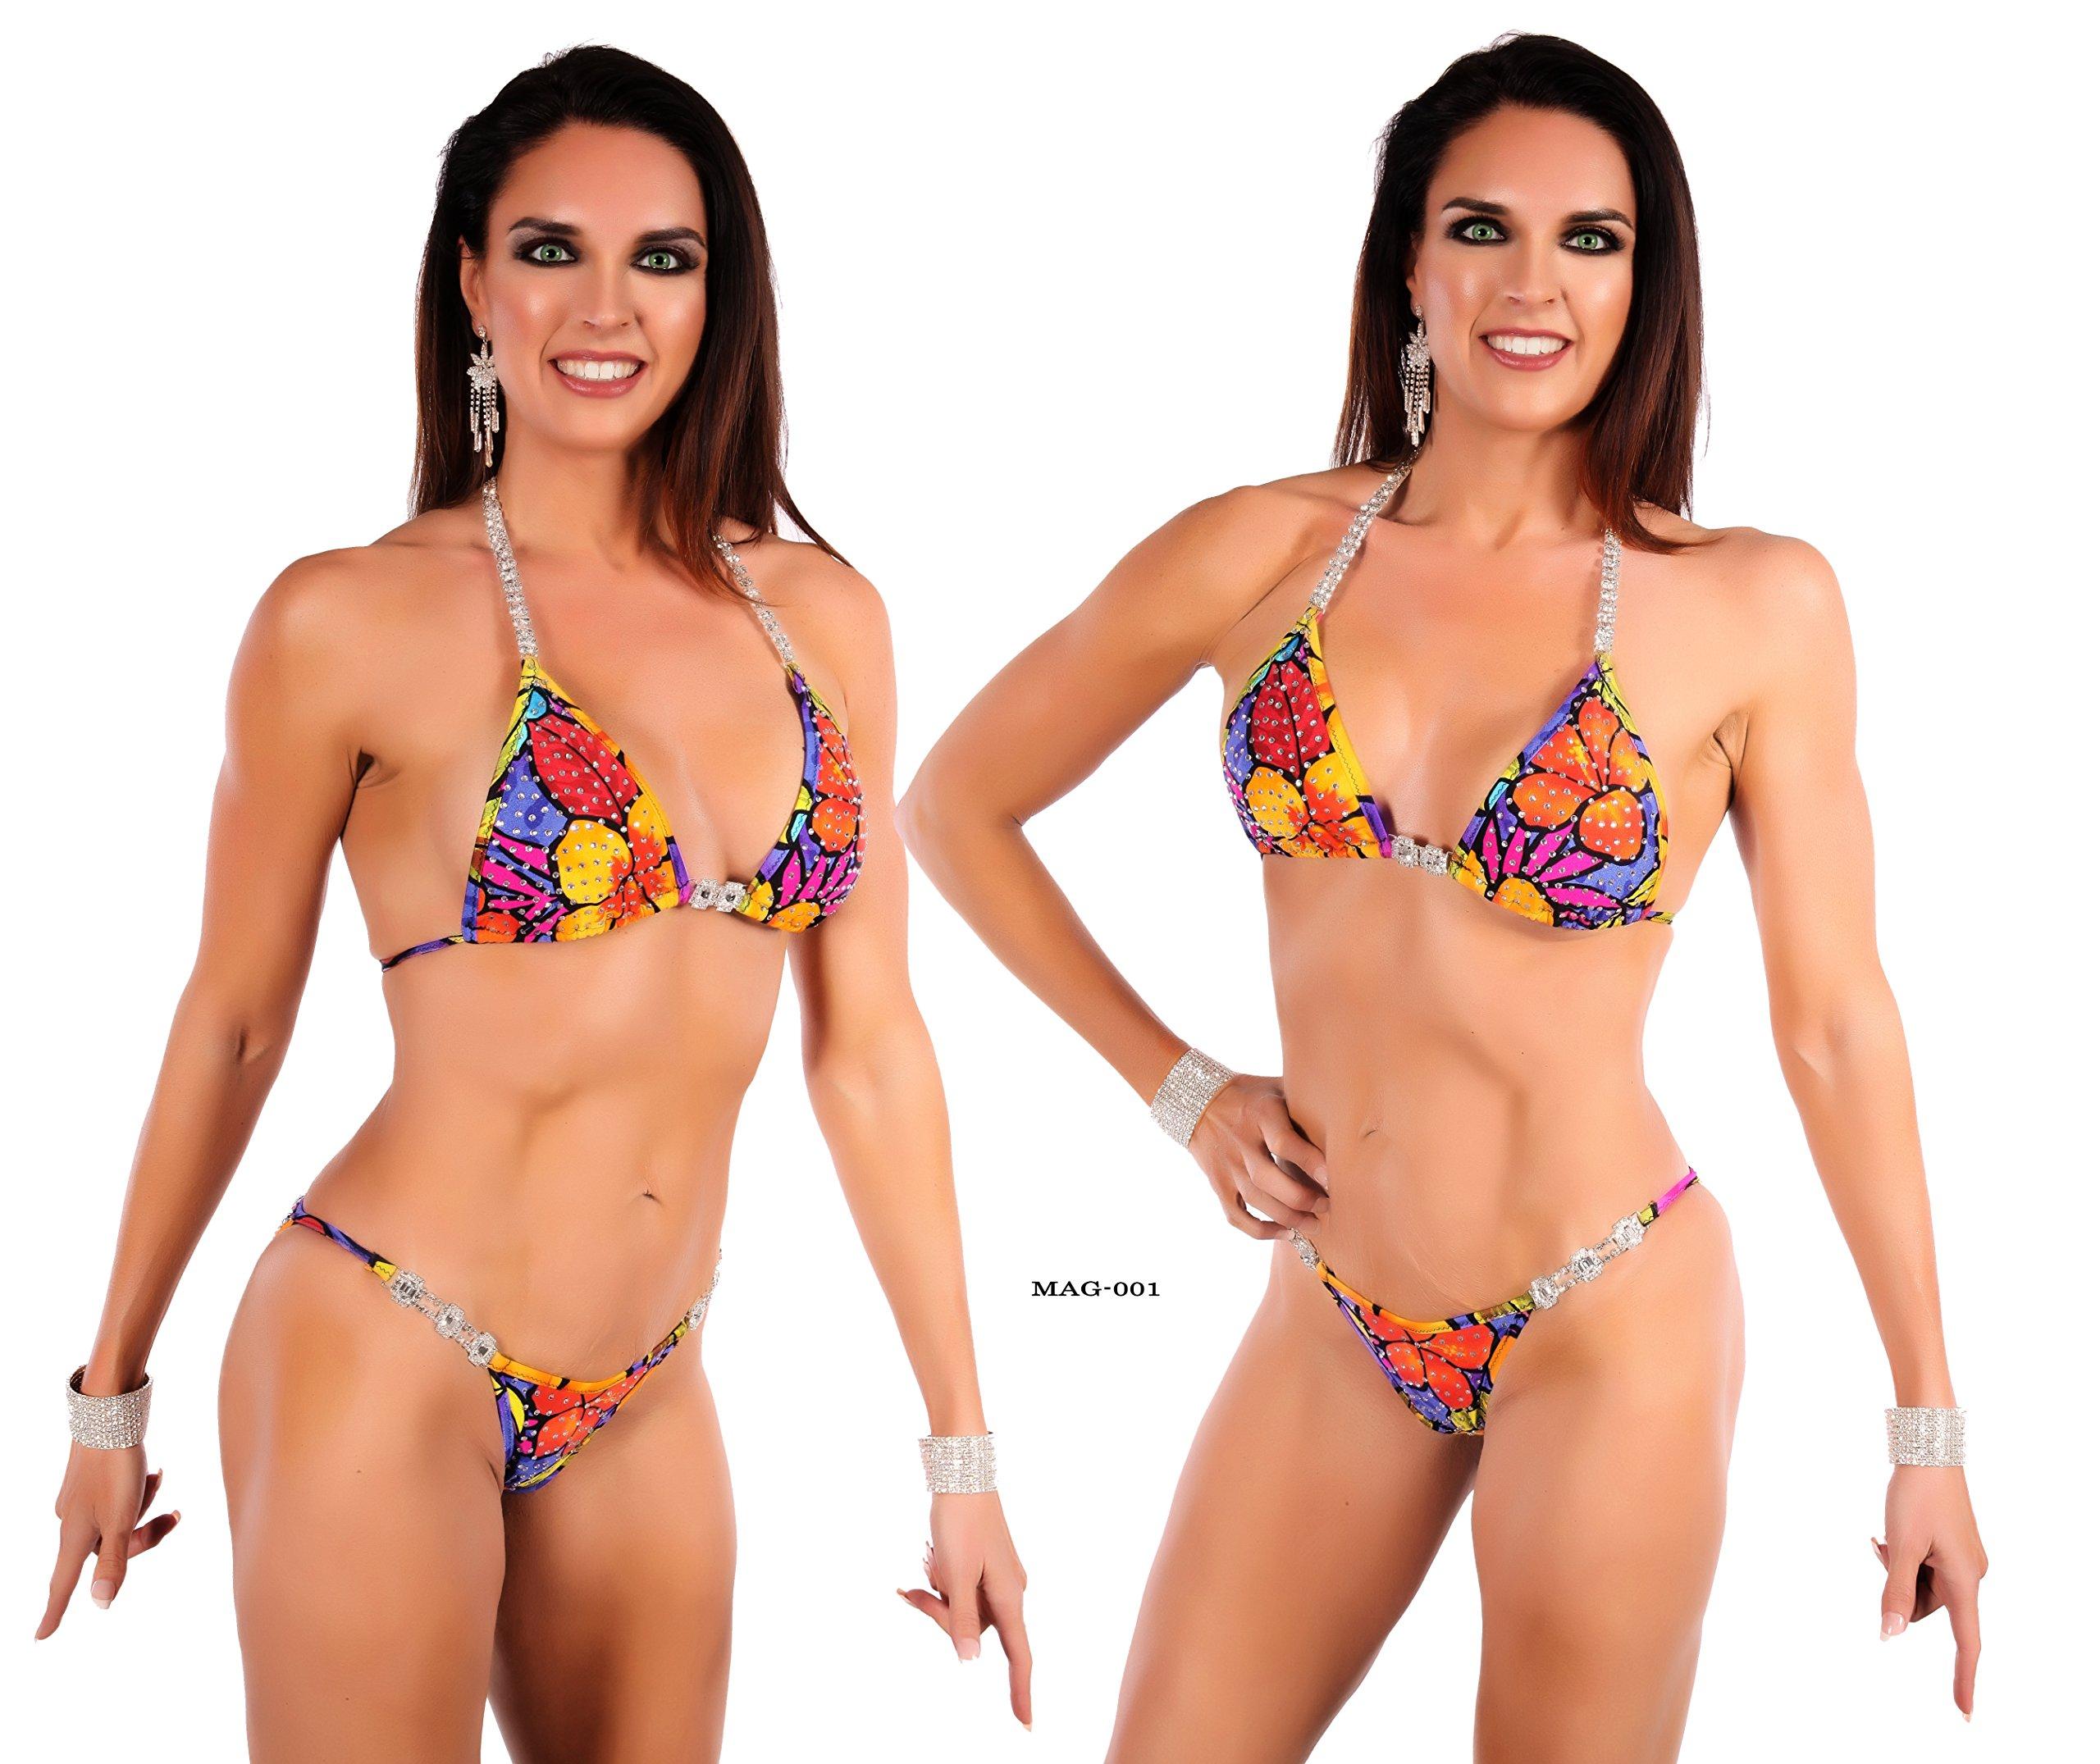 Competition Bikini Suit wtih 5 Connectors and Swarovski Imitation Crystals